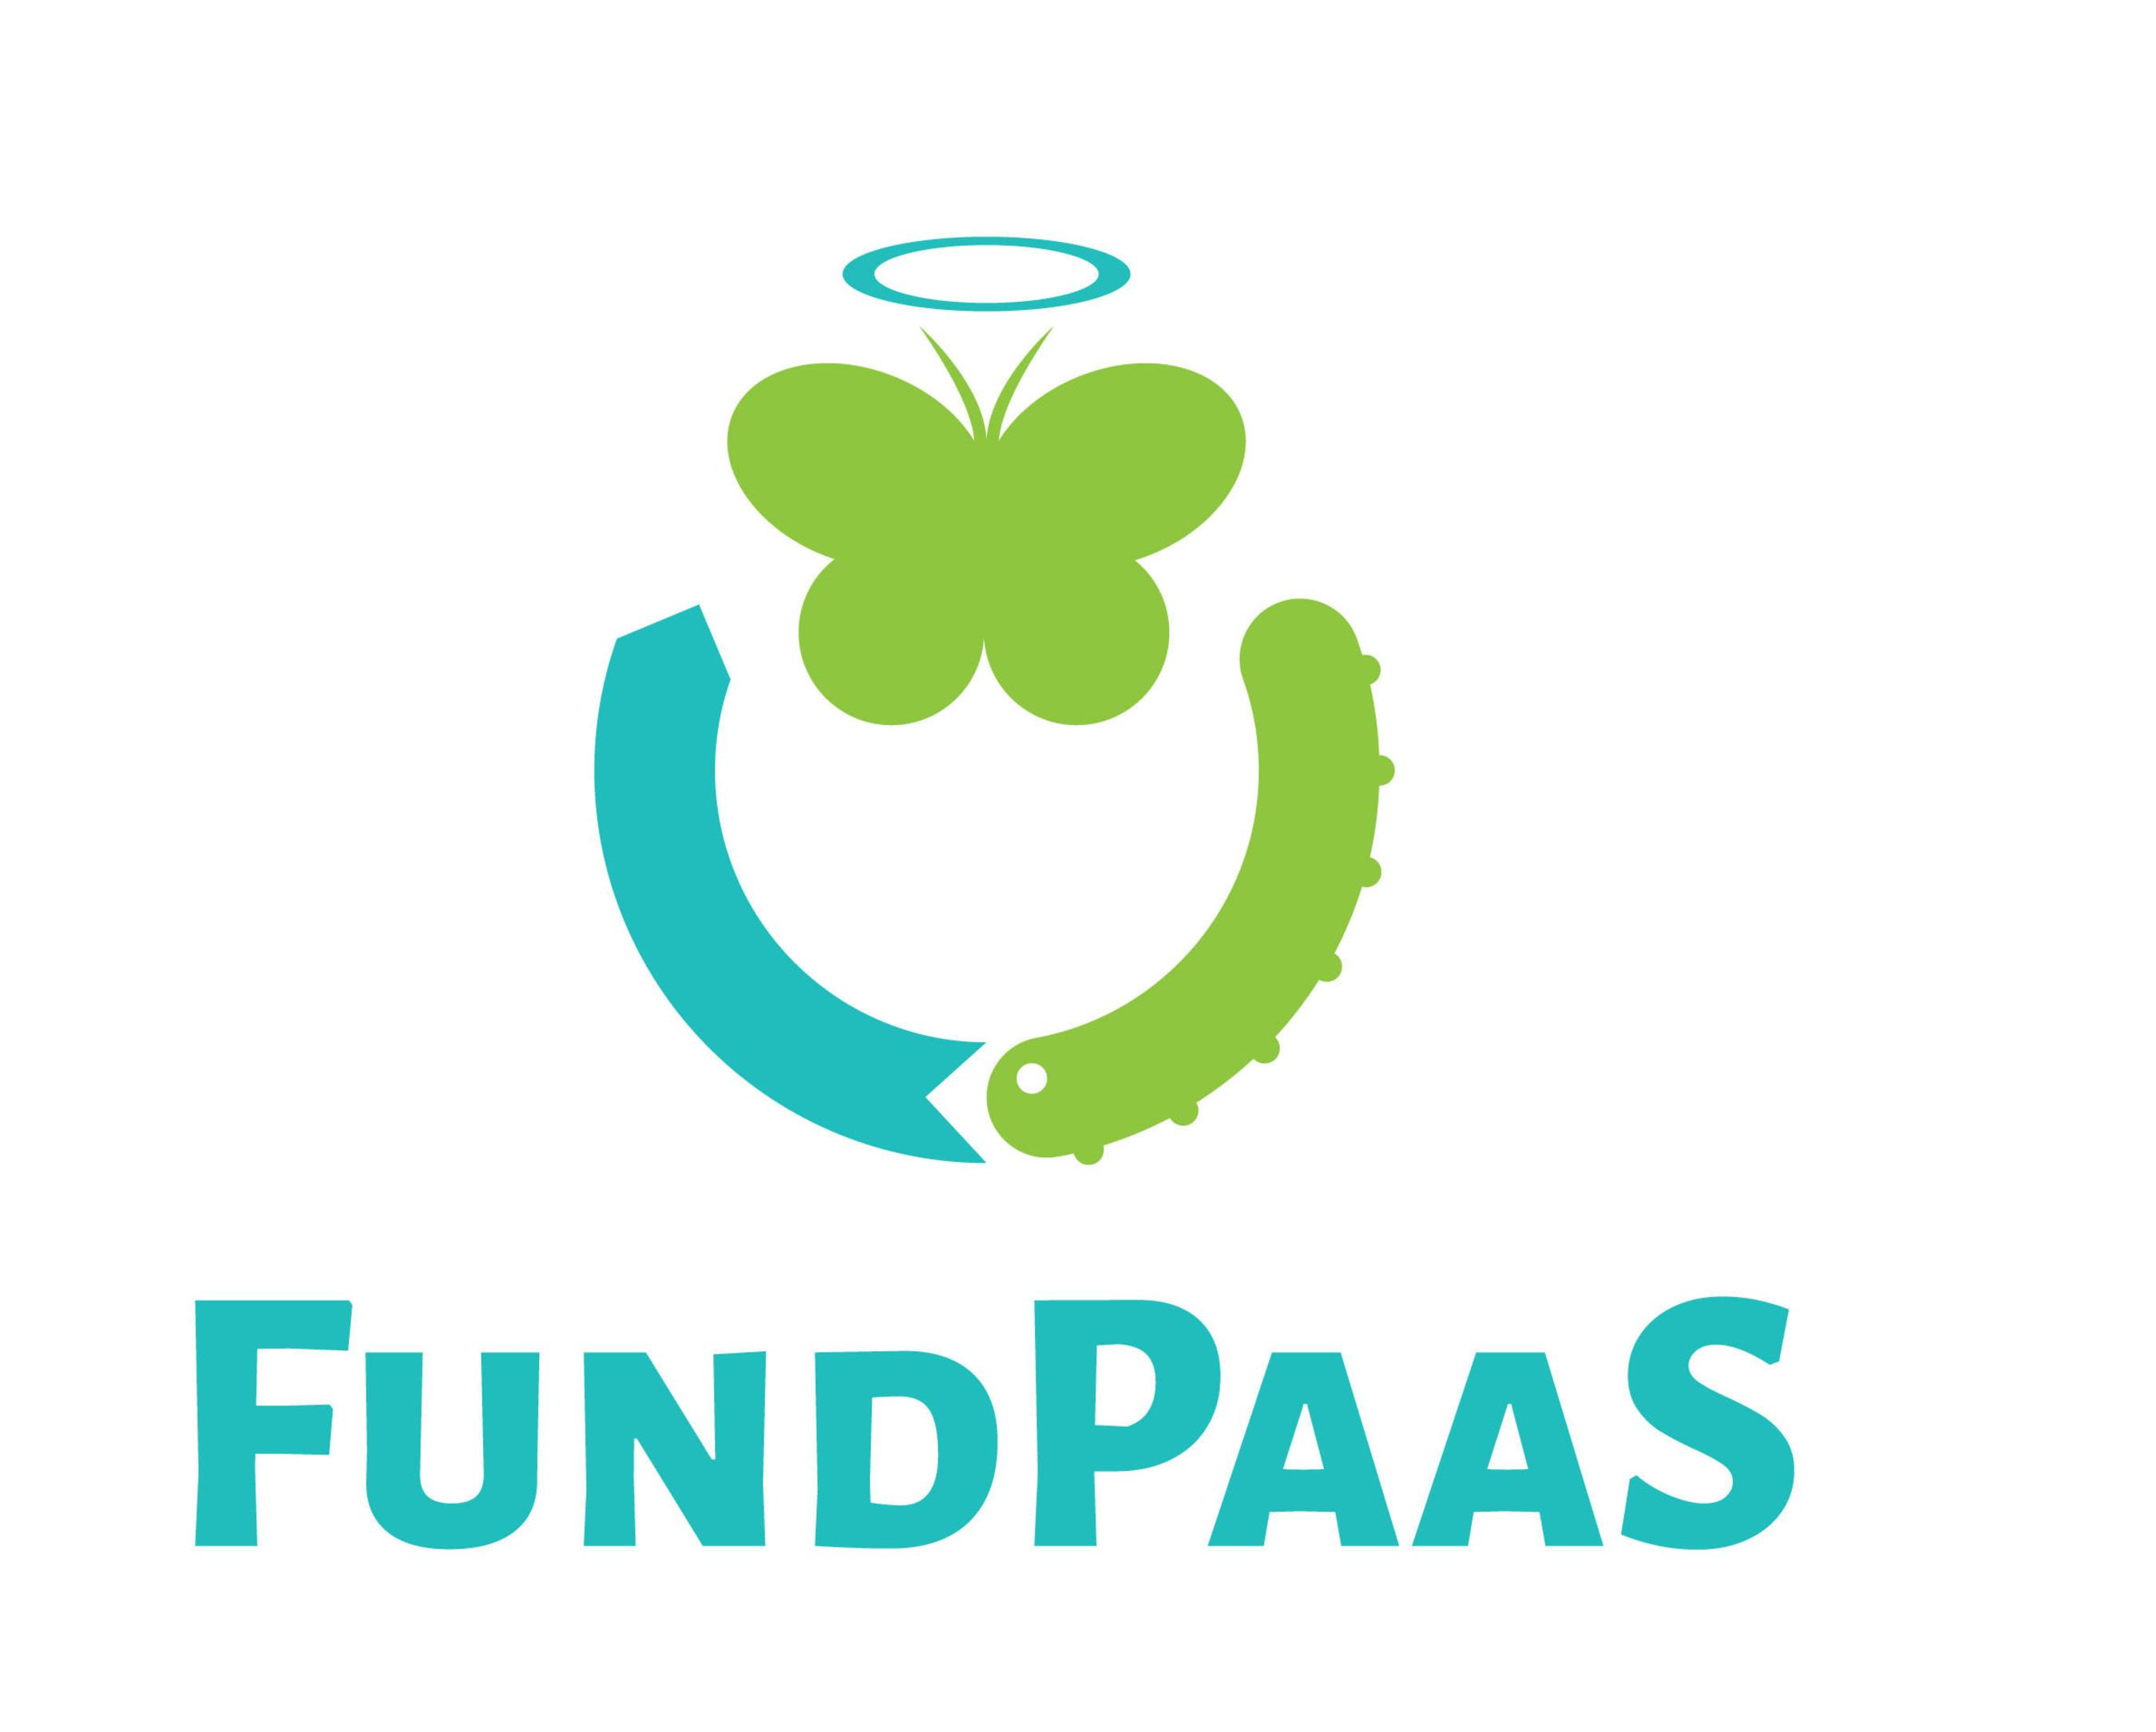 FundPaaS Logo